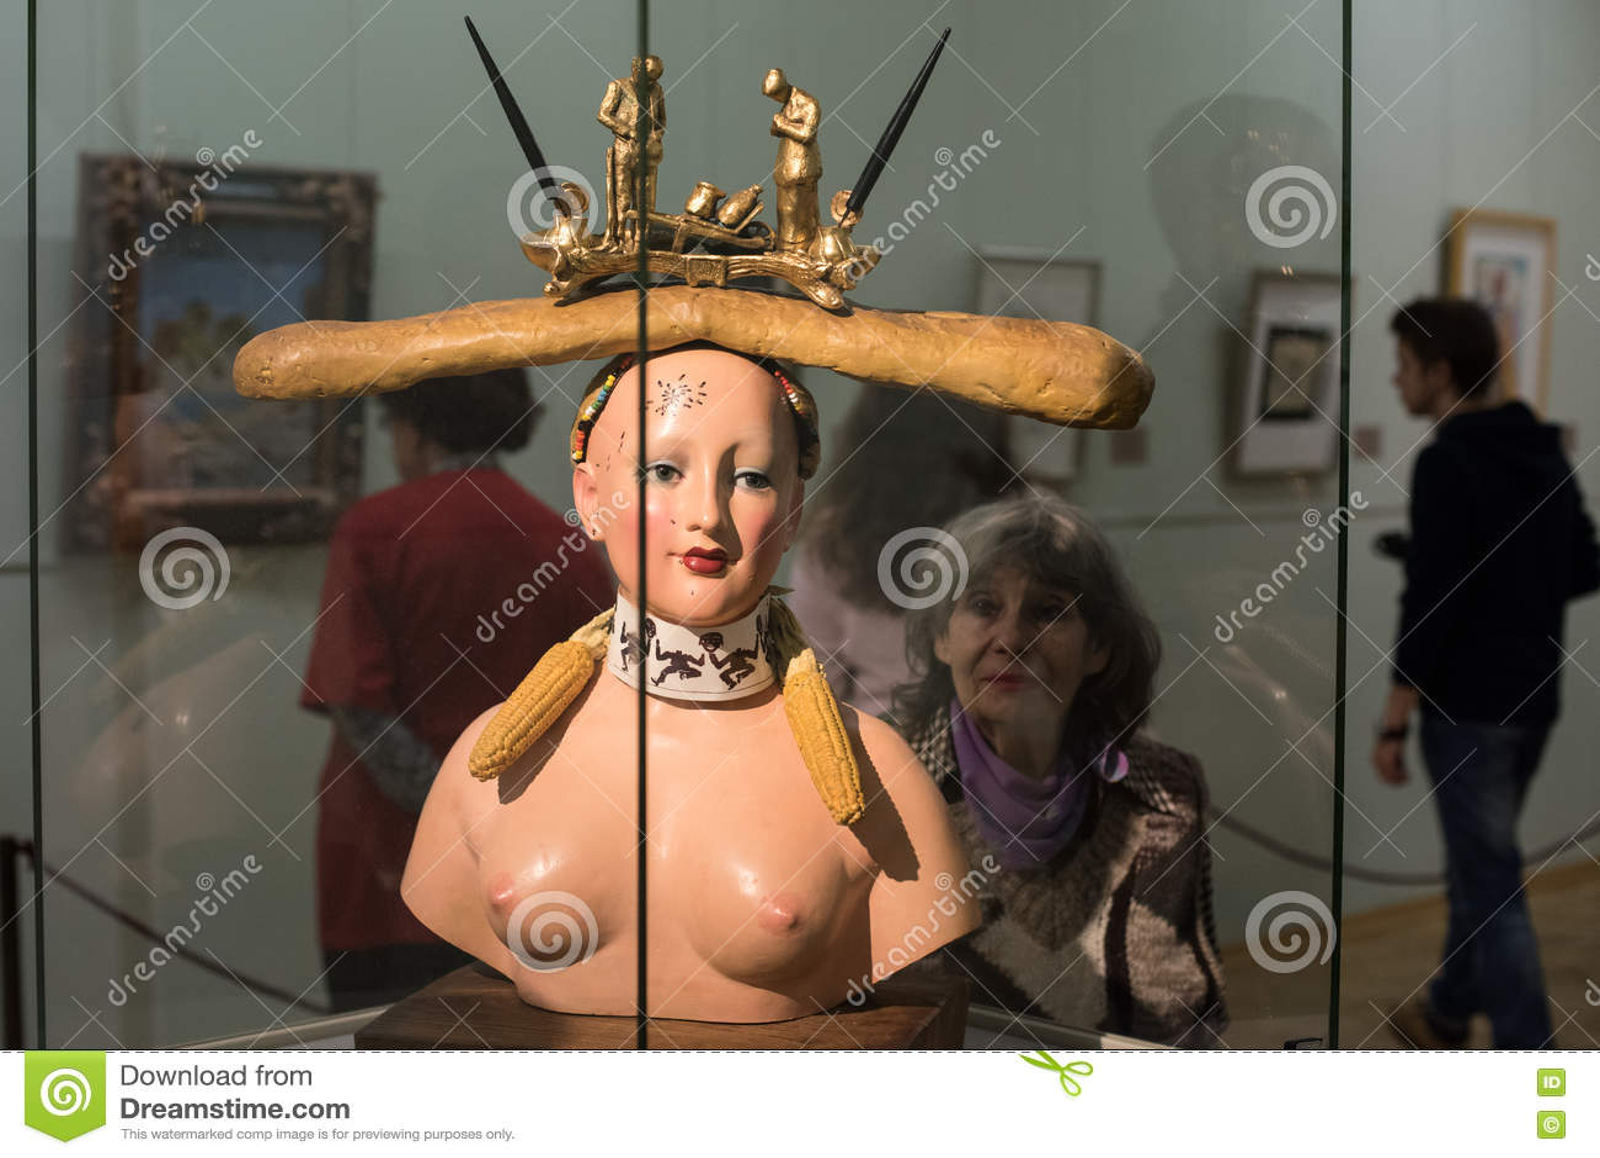 Retrospective Female Bust